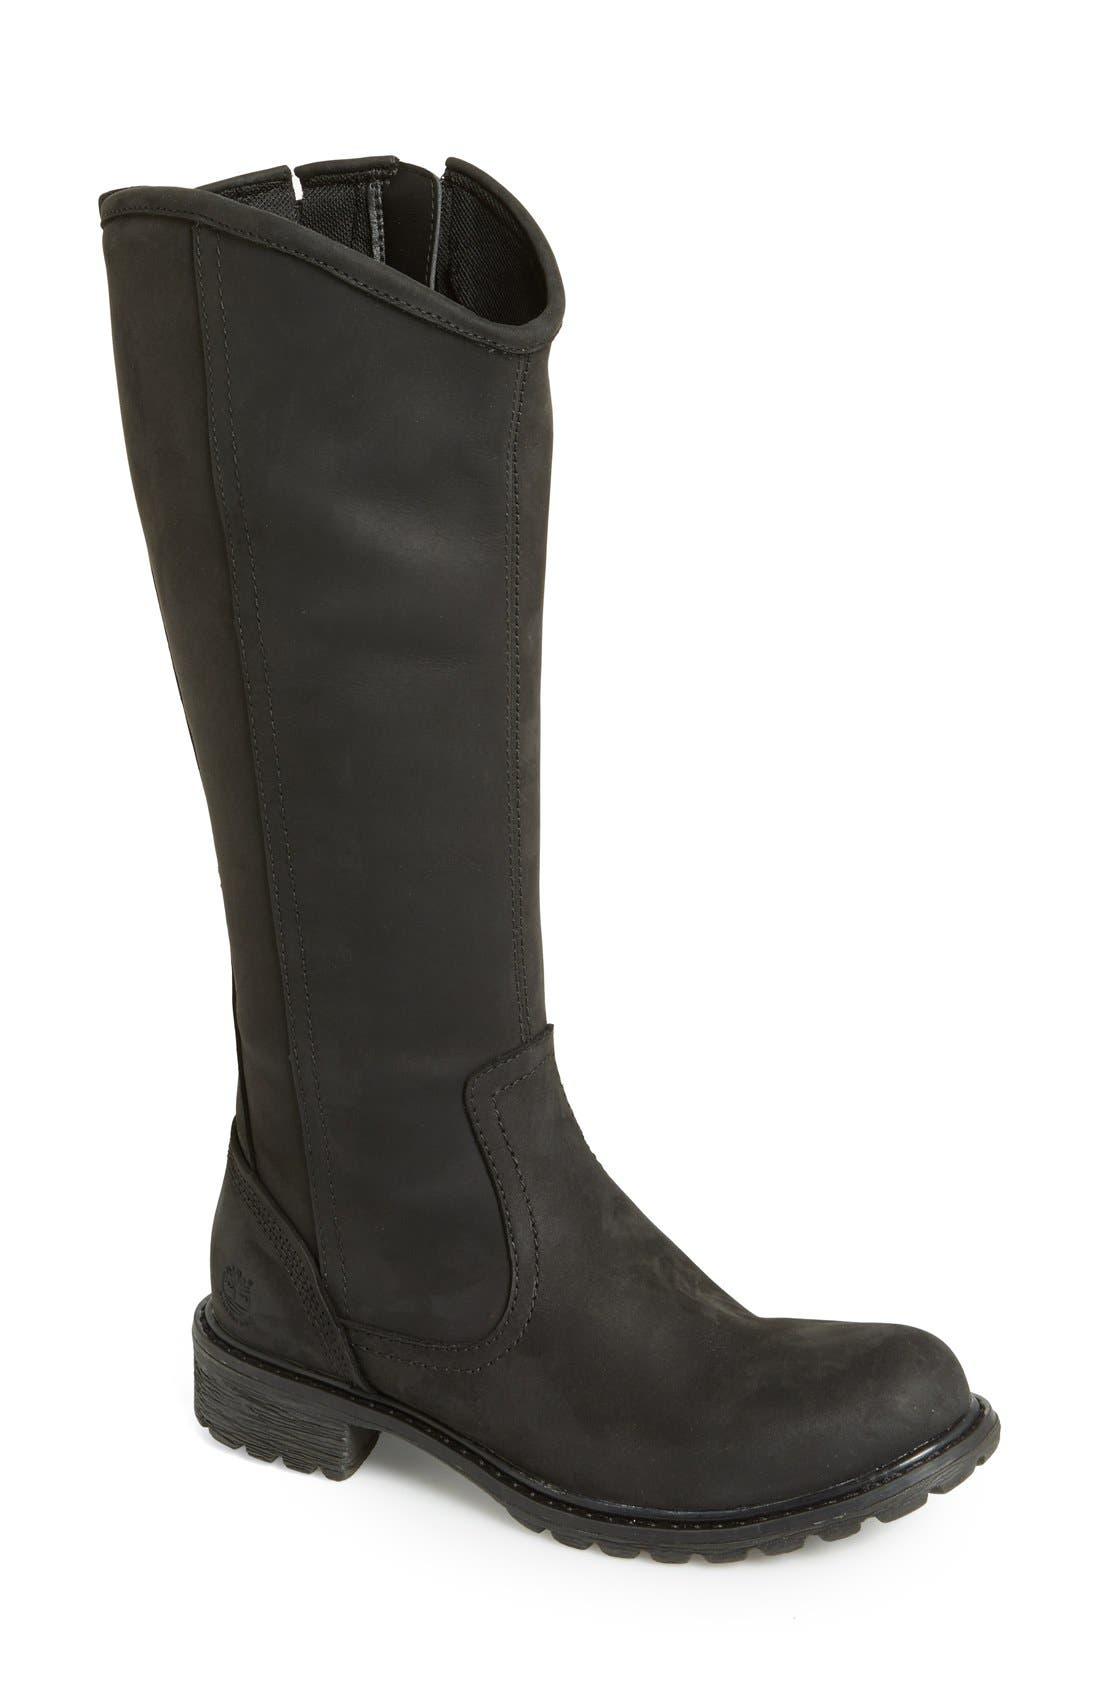 Alternate Image 1 Selected - Timberland Earthkeepers® 'Stoddard' Tall Waterproof Boot (Women)